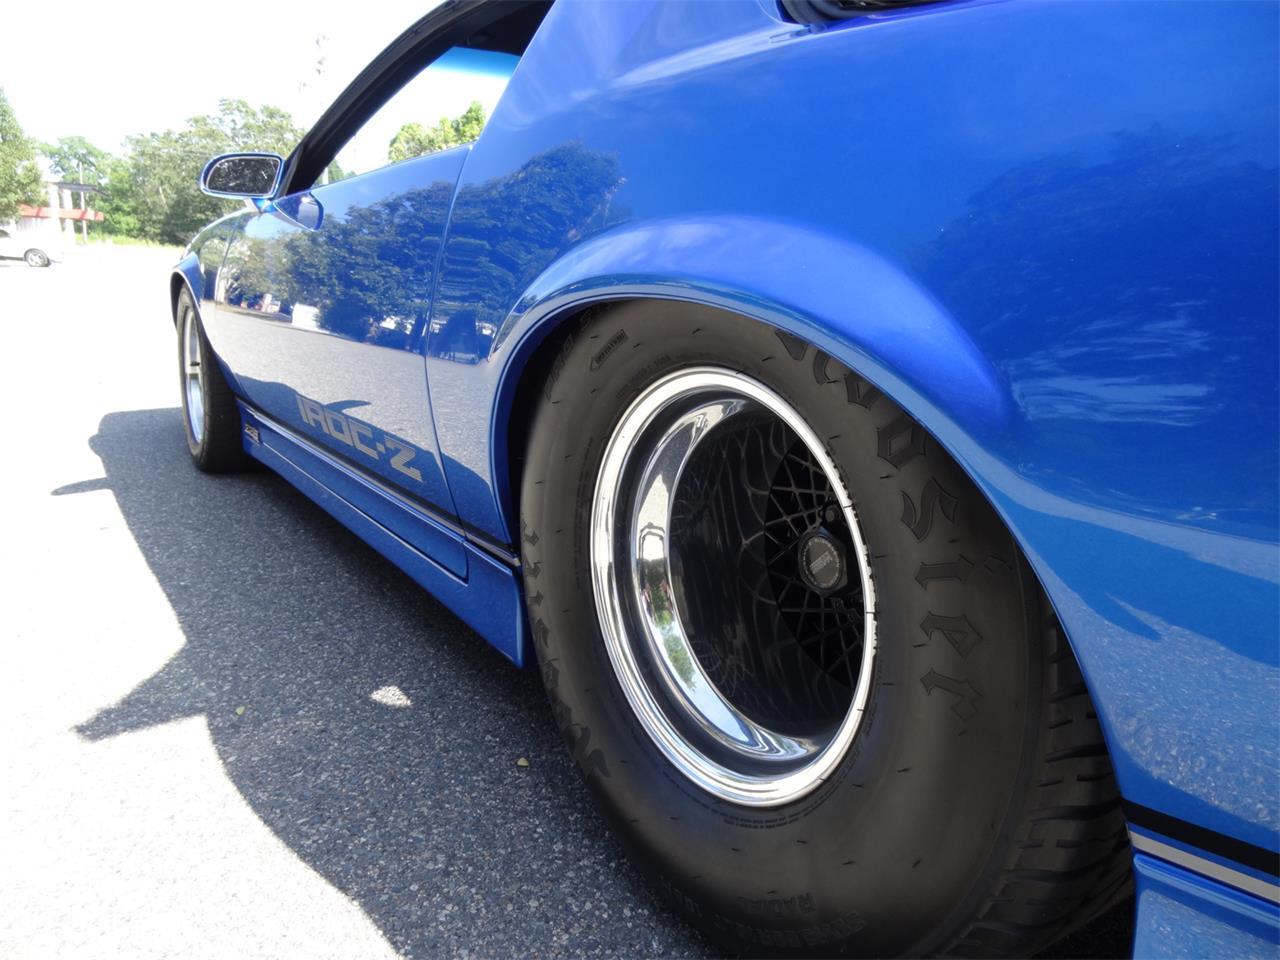 Large Picture of '83 Chevrolet Camaro IROC Z28 located in Massachusetts - $30,000.00 - QUEA